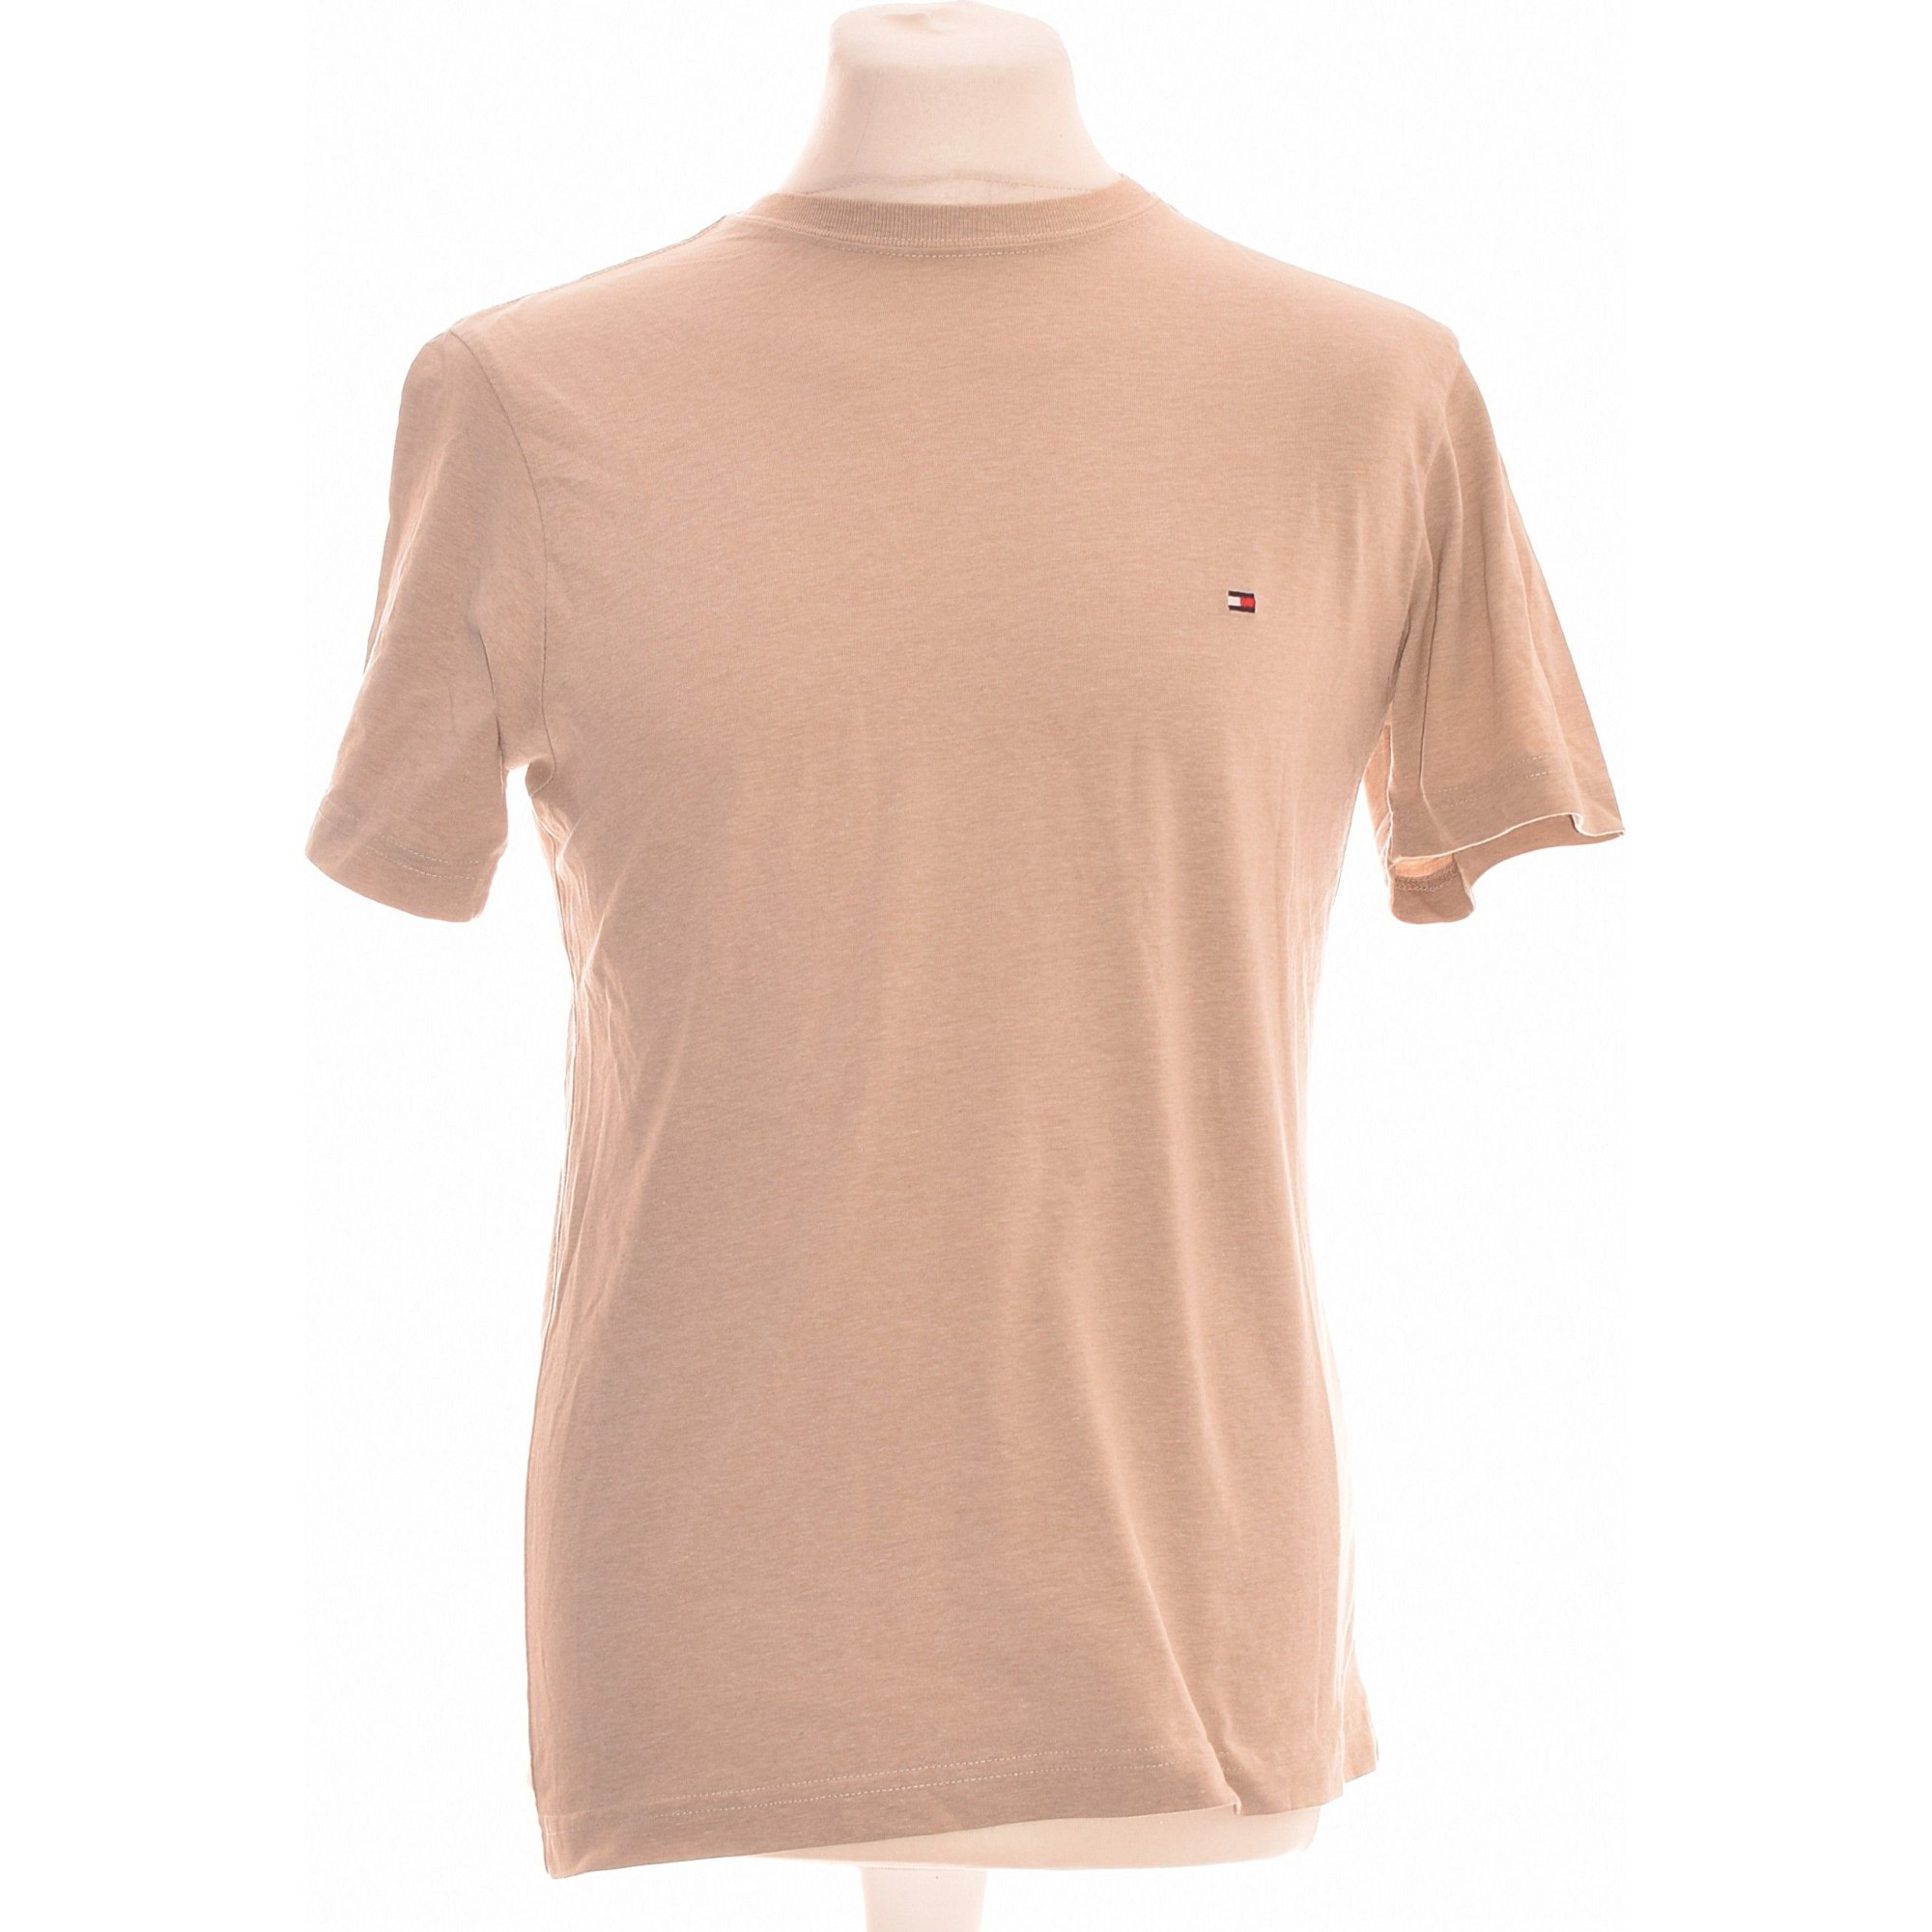 Tee-shirt TOMMY HILFIGER Beige, camel